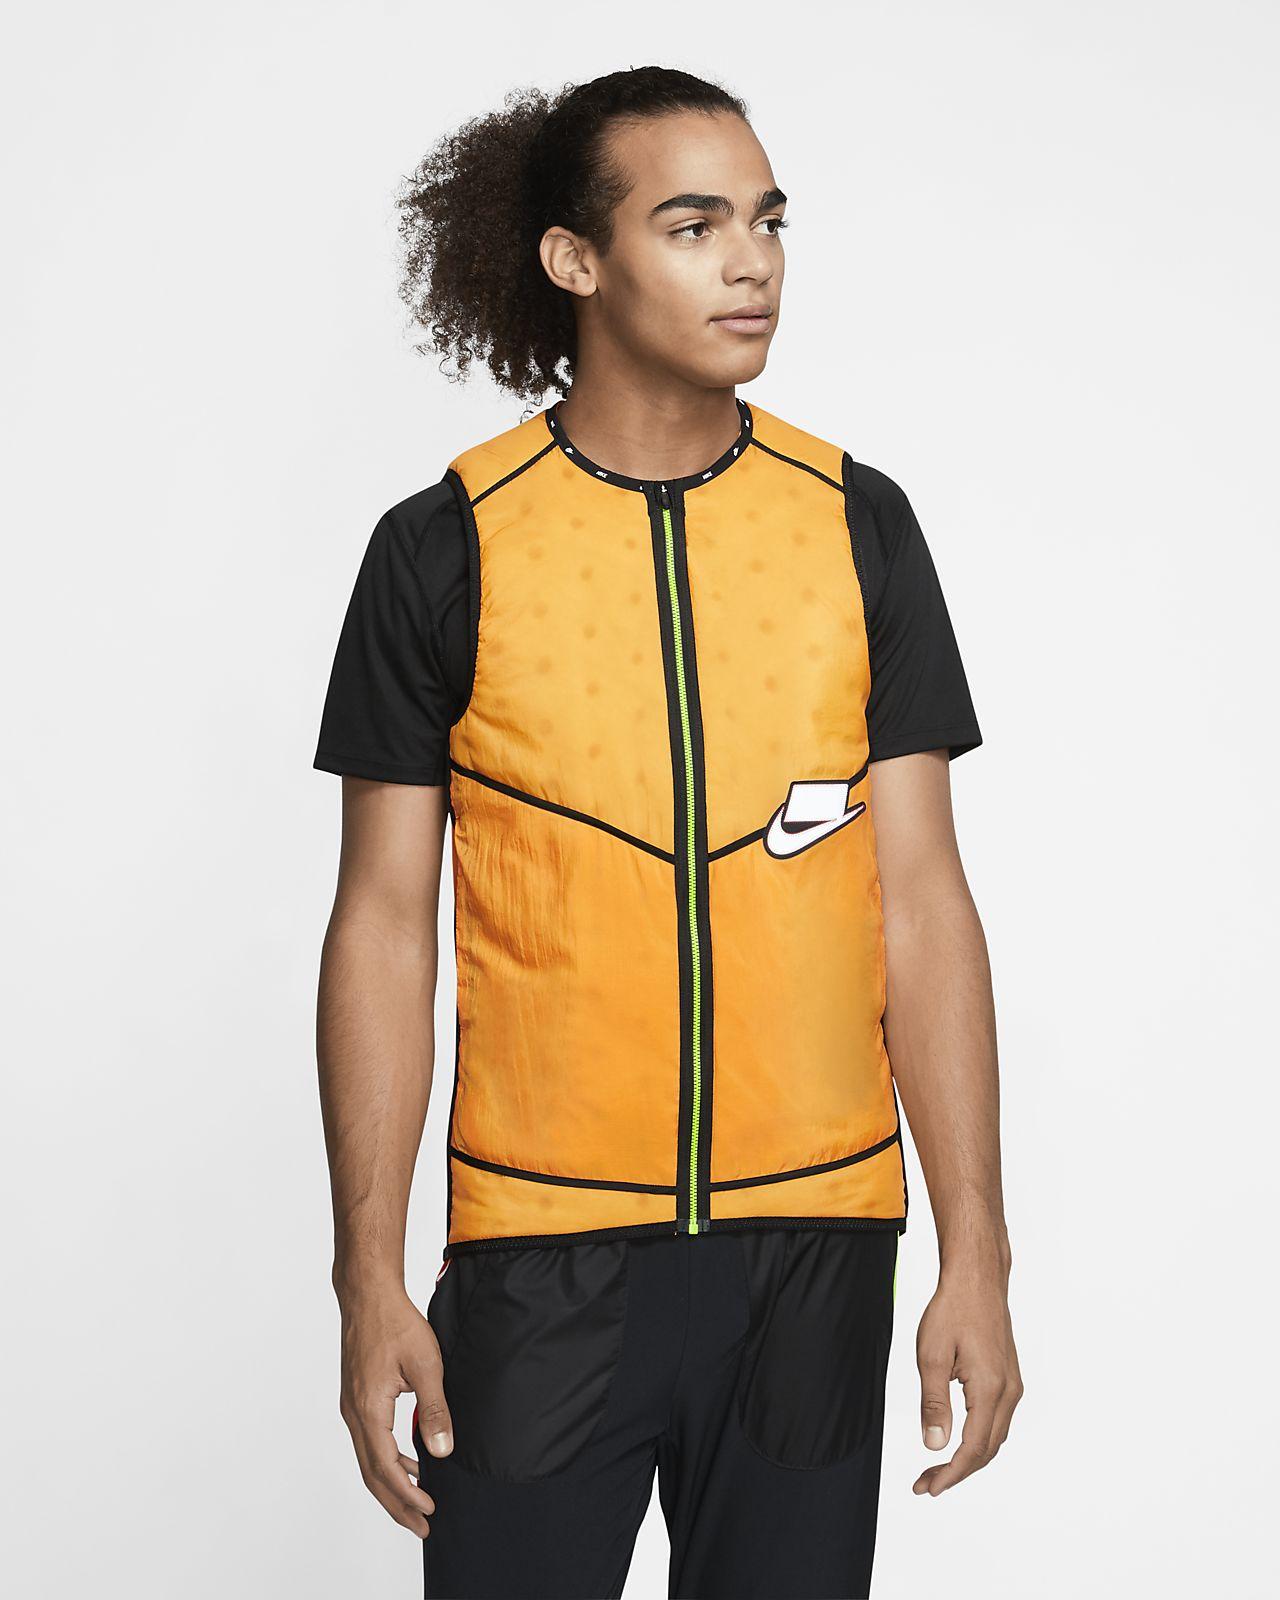 Nike AeroLayer Wild Run Men's Running Vest